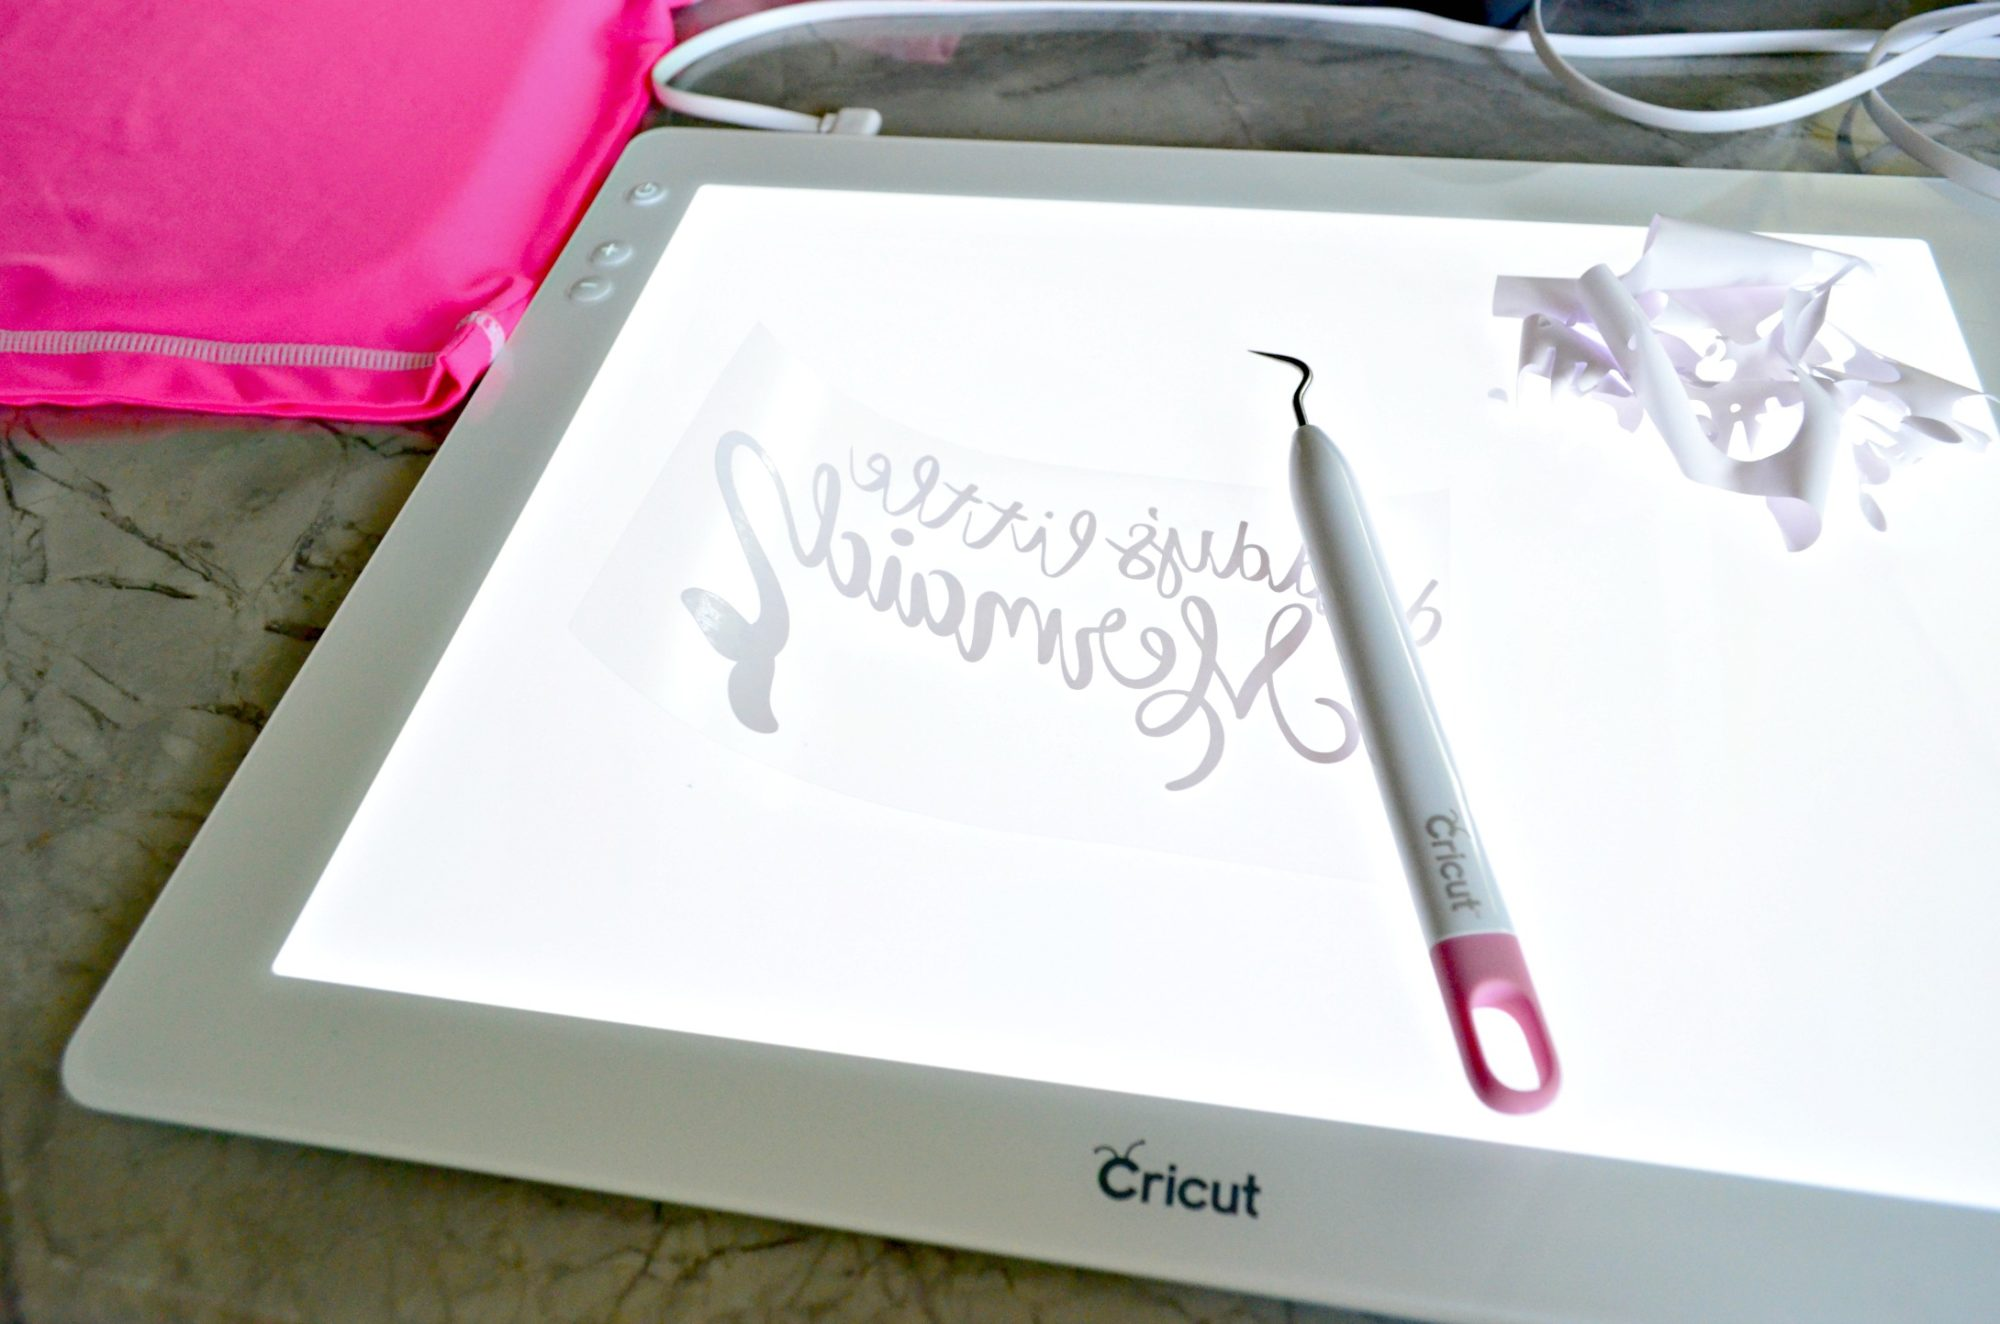 Cricut BrightPad with Iron-On Vinyl